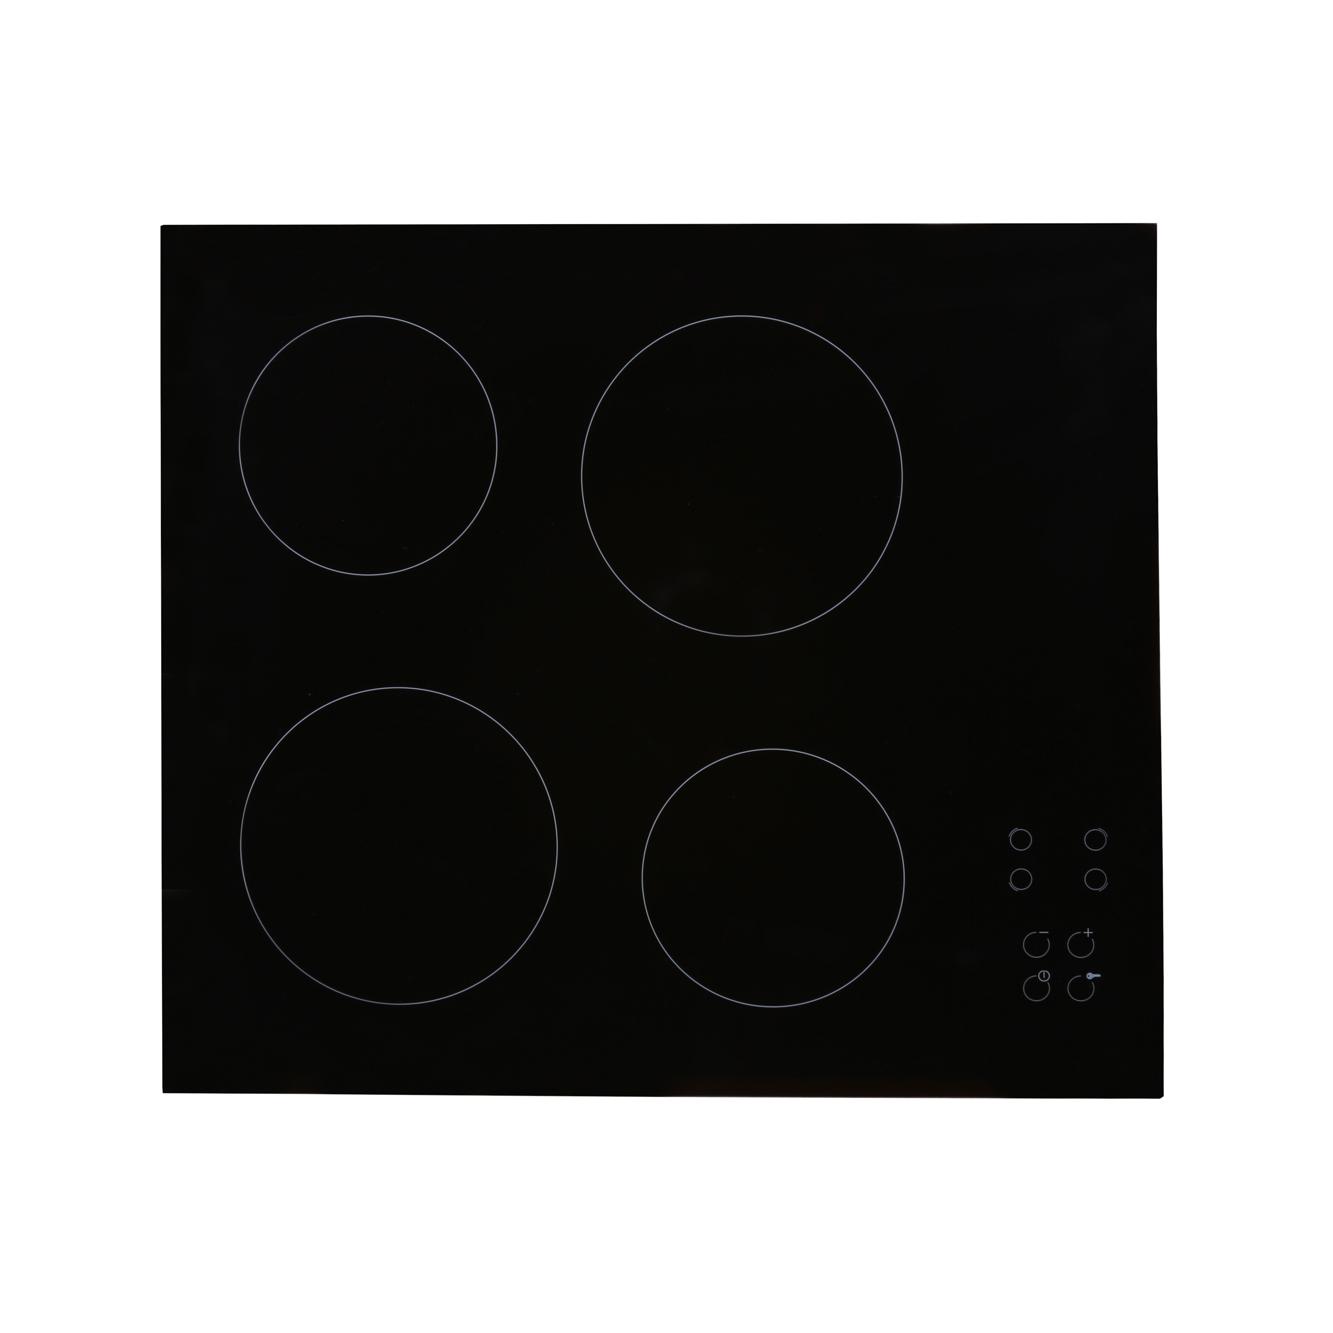 Matrix MHC002FR Ceramic Hob